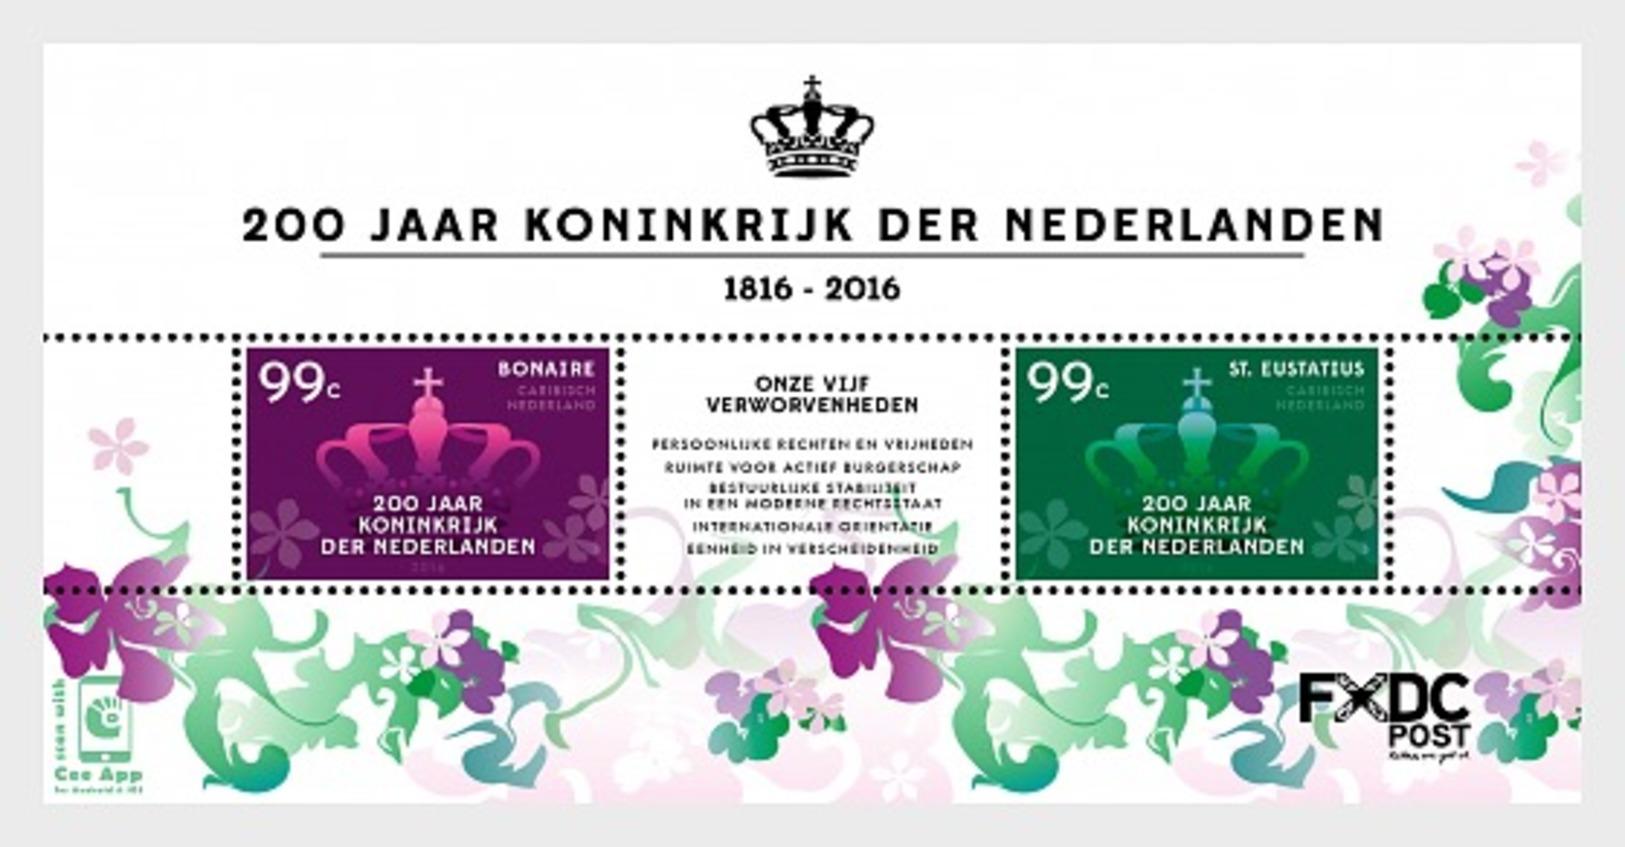 H01 Caribbean Netherlands 2016 Kingdom Netherlands Bonaire MNH Postfrisch - Curaçao, Antille Olandesi, Aruba